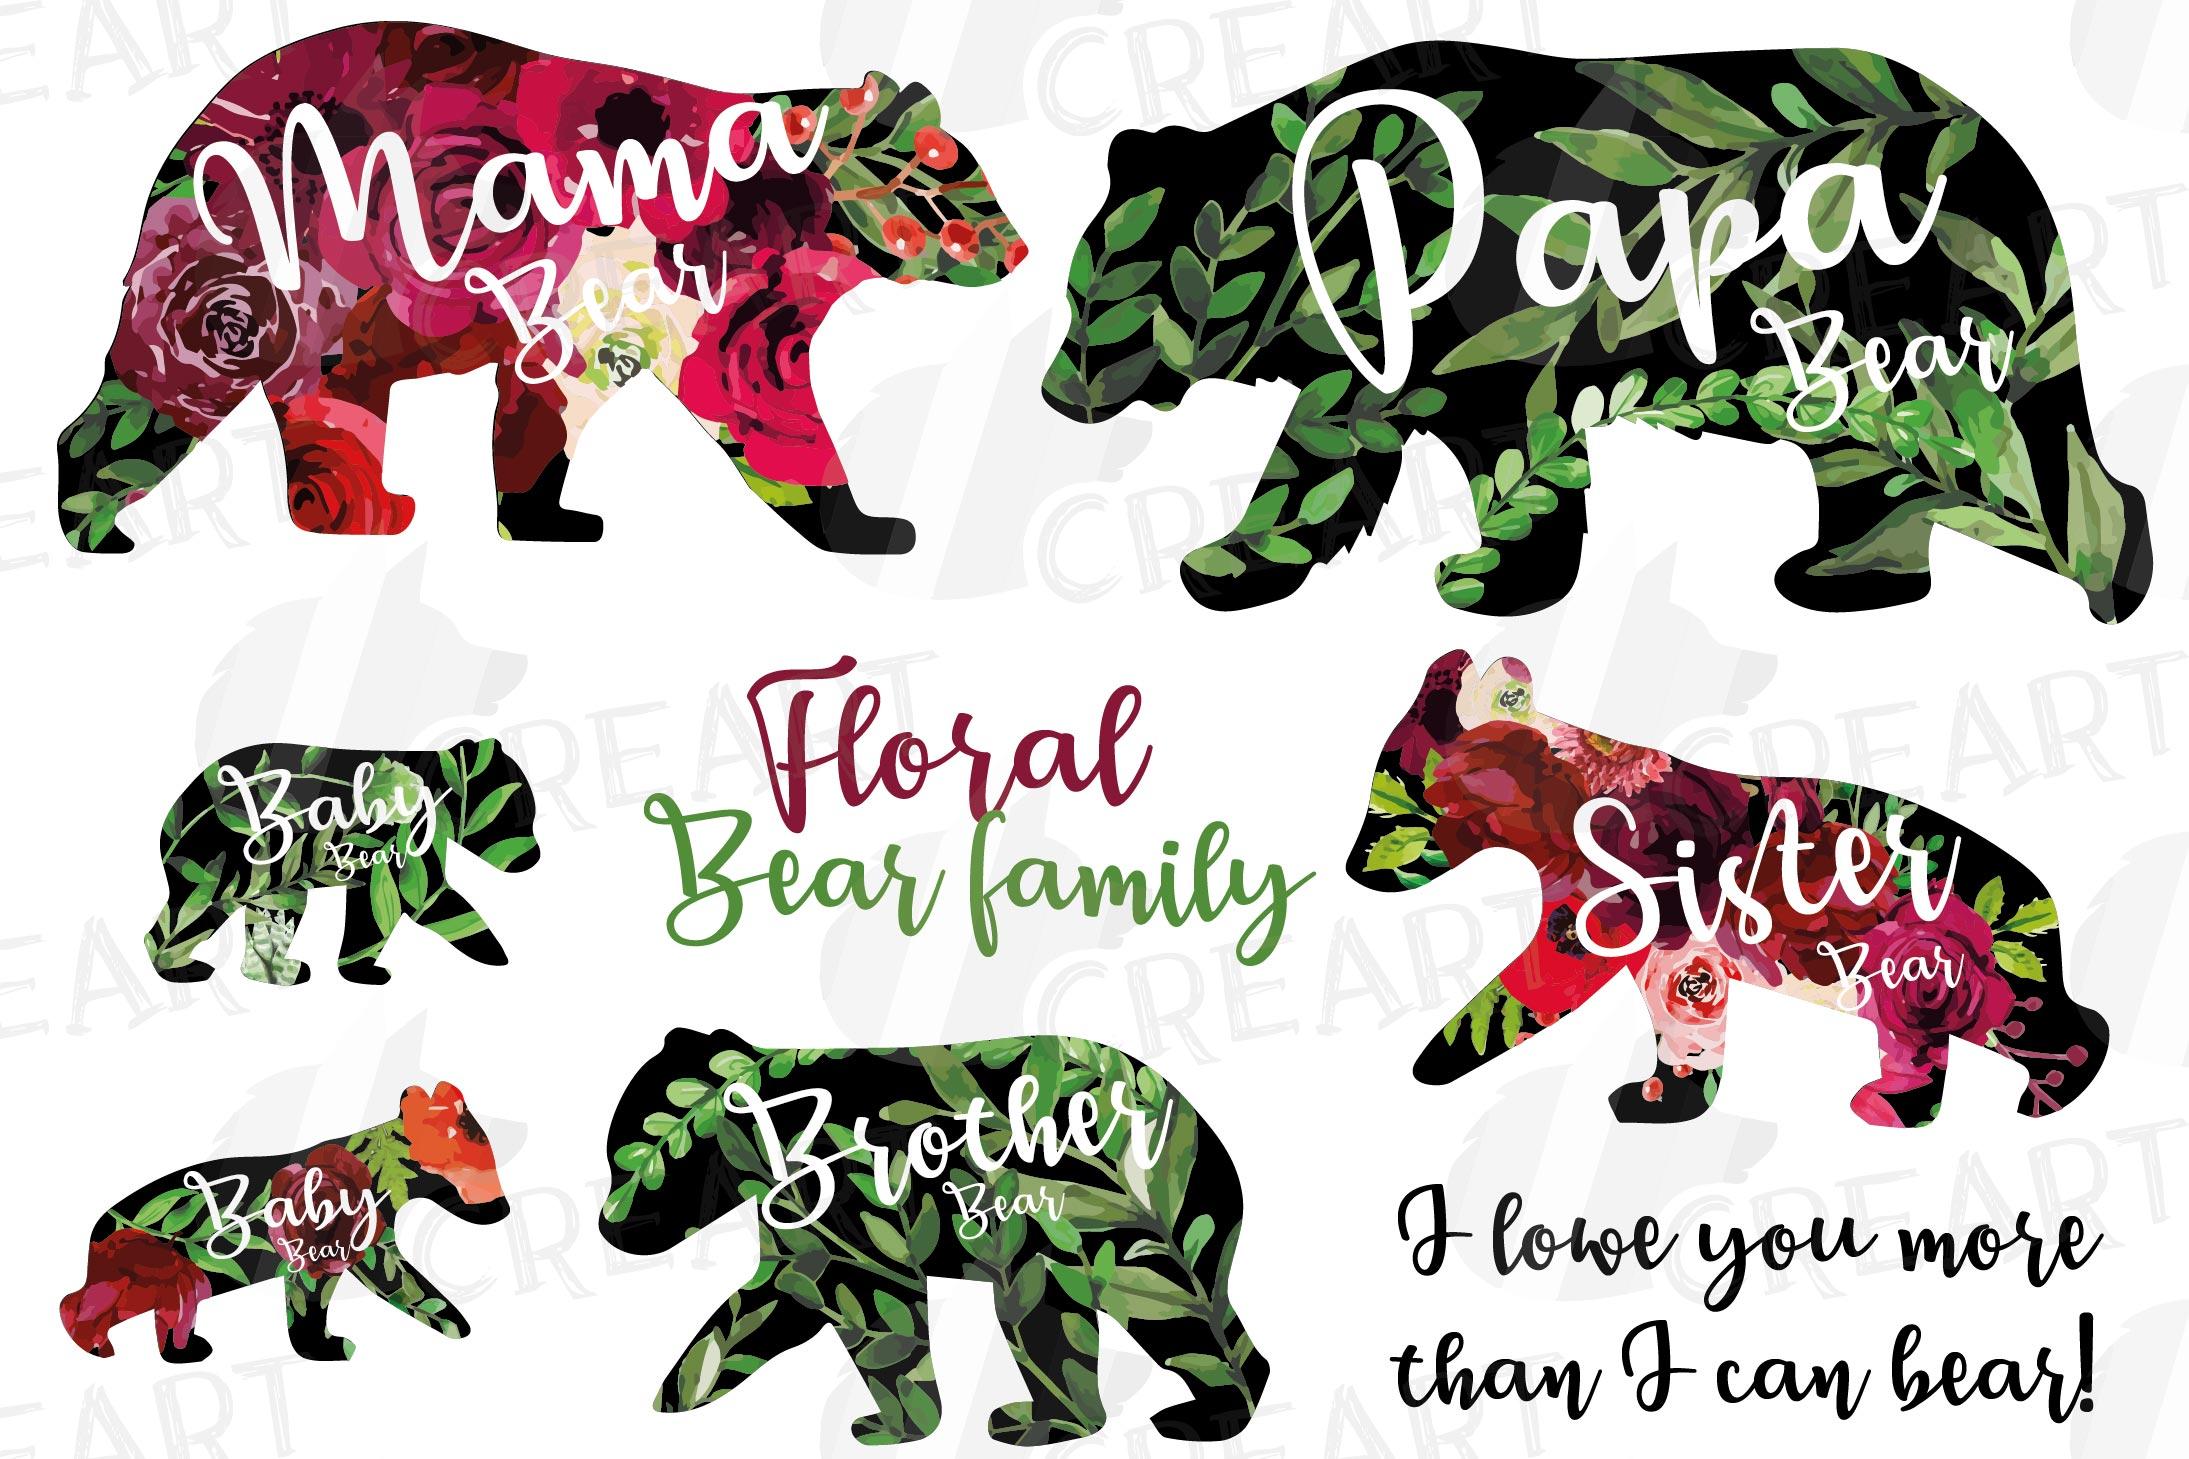 Floral bear family, sister, brother, baby, papa, mama bear example image 1